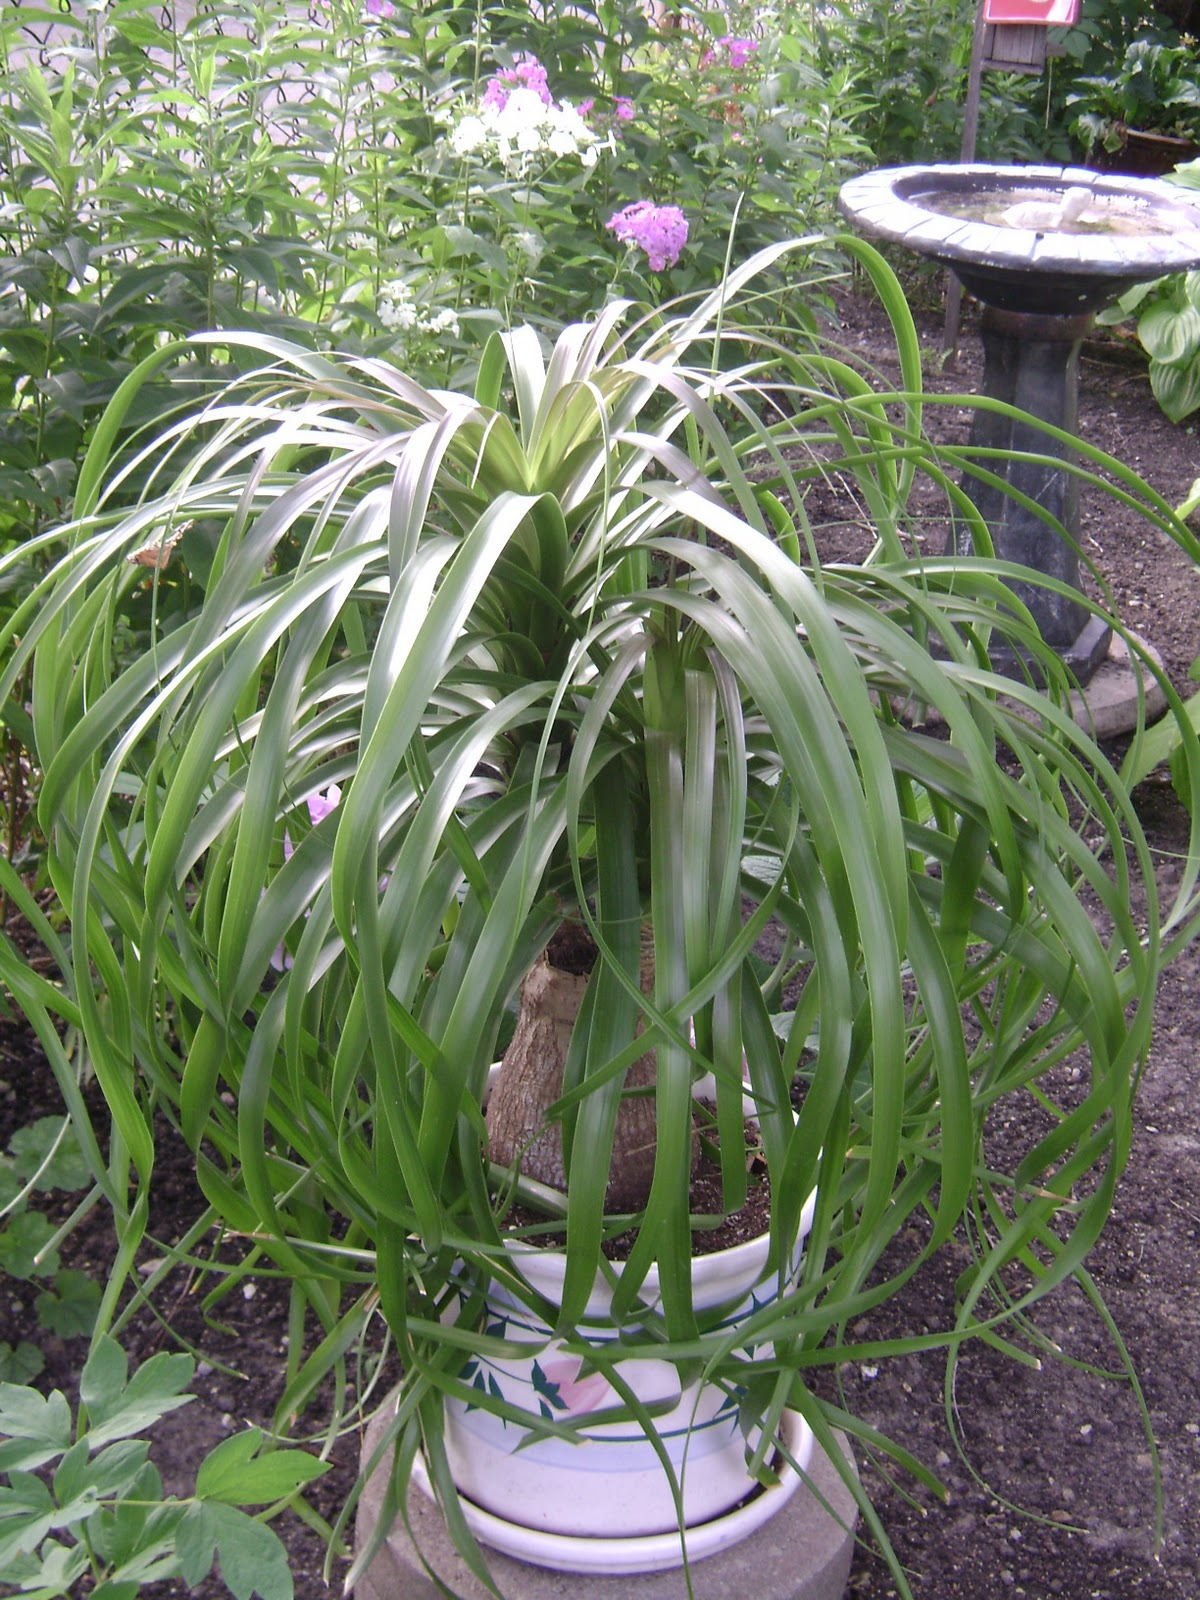 Pony tail palm (Beaucarnea recurvata)